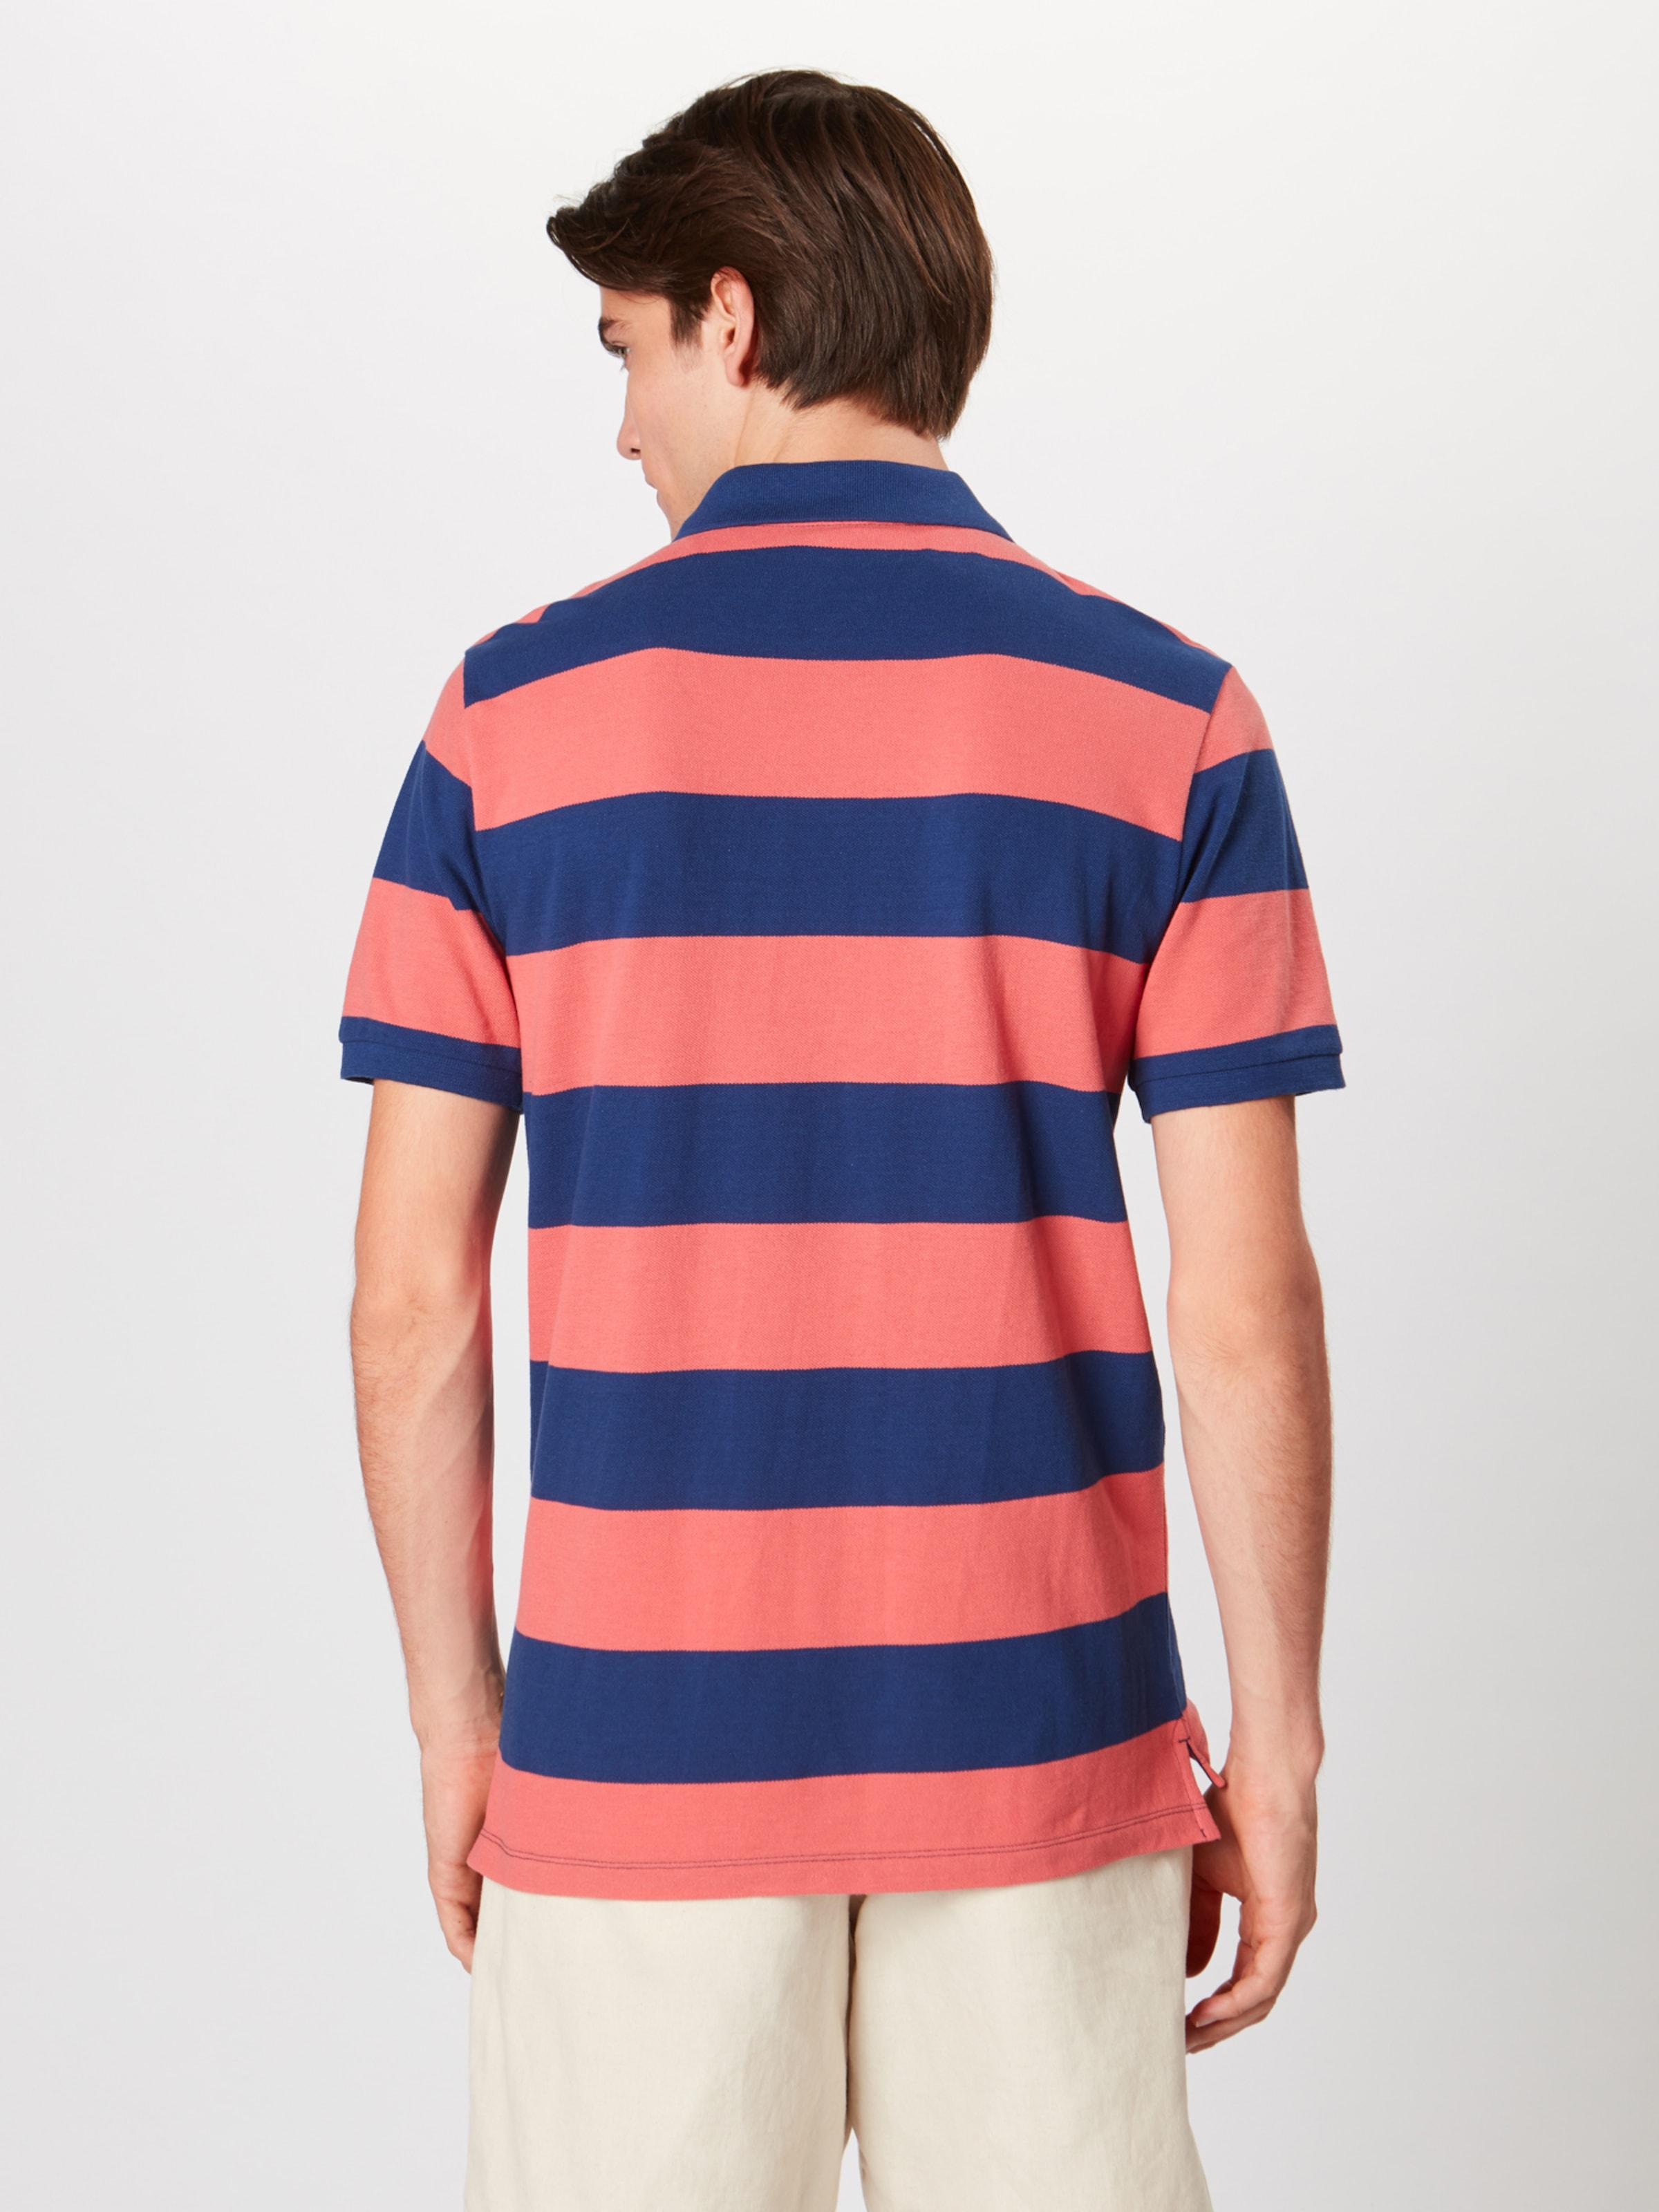 T En Bleu MarineRose Gap shirt dthCrsQ